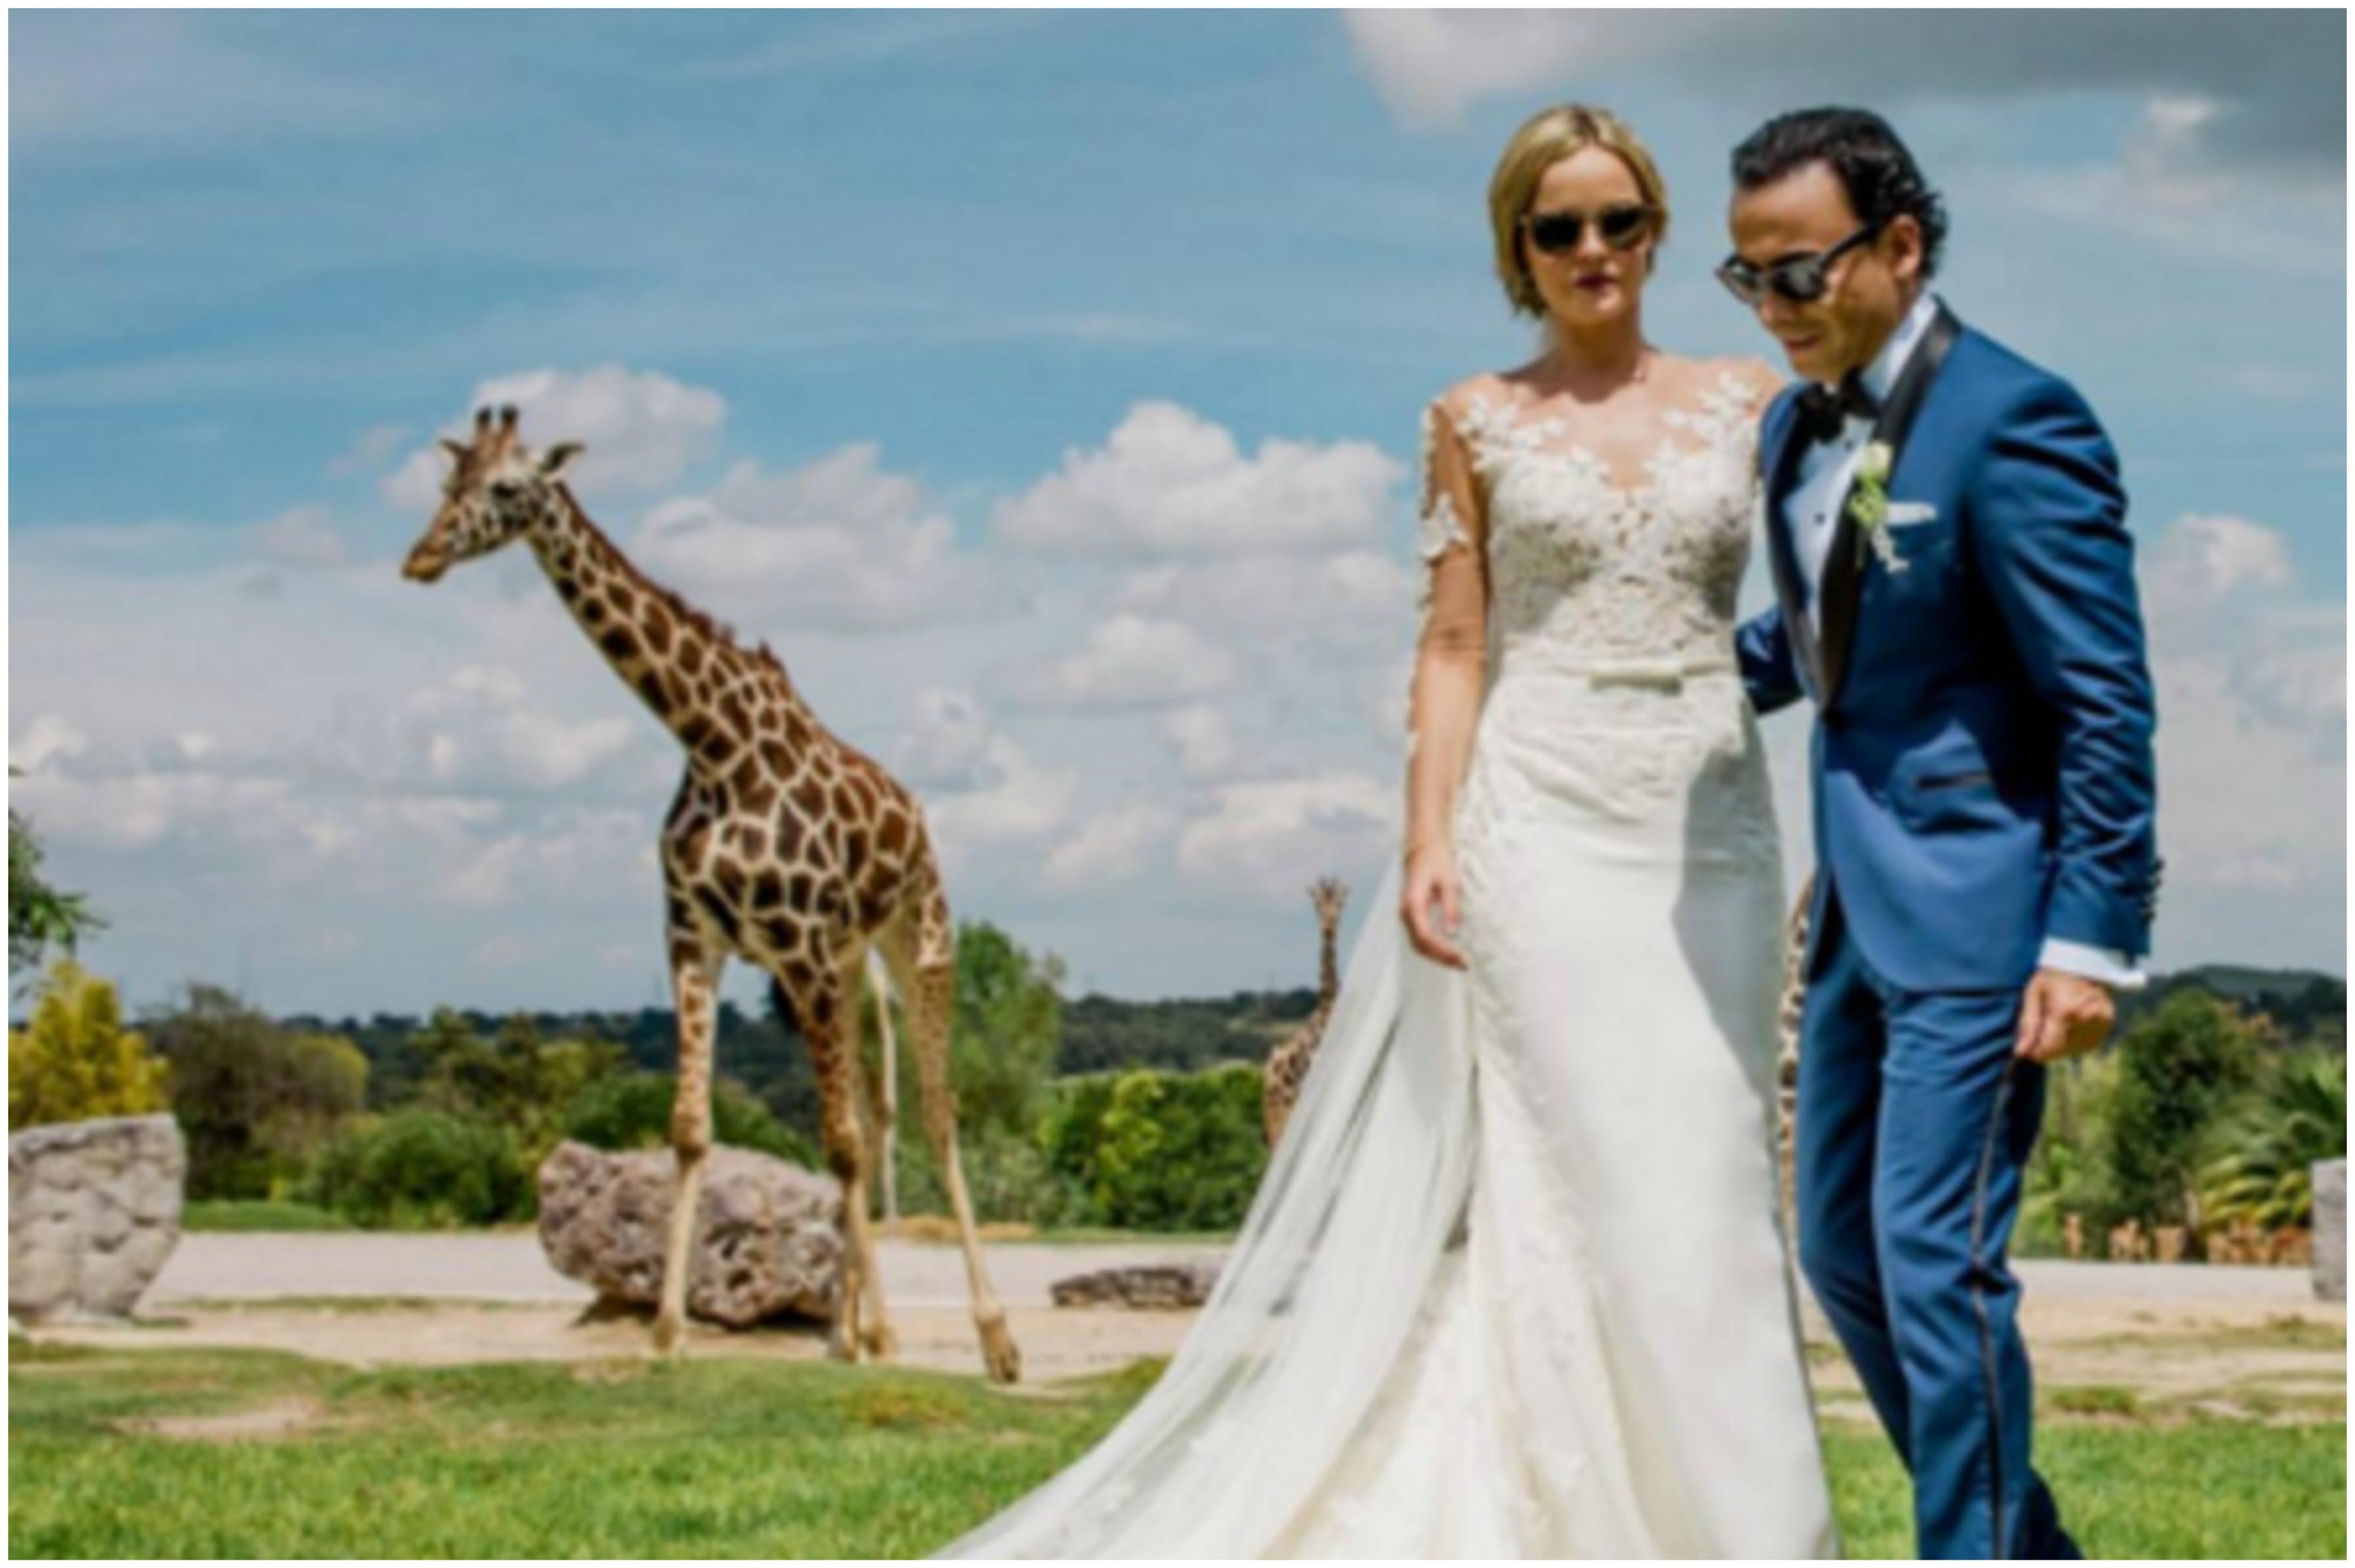 Adal Ramones se casó con Karla de la Mora con jirafas como testigos ...